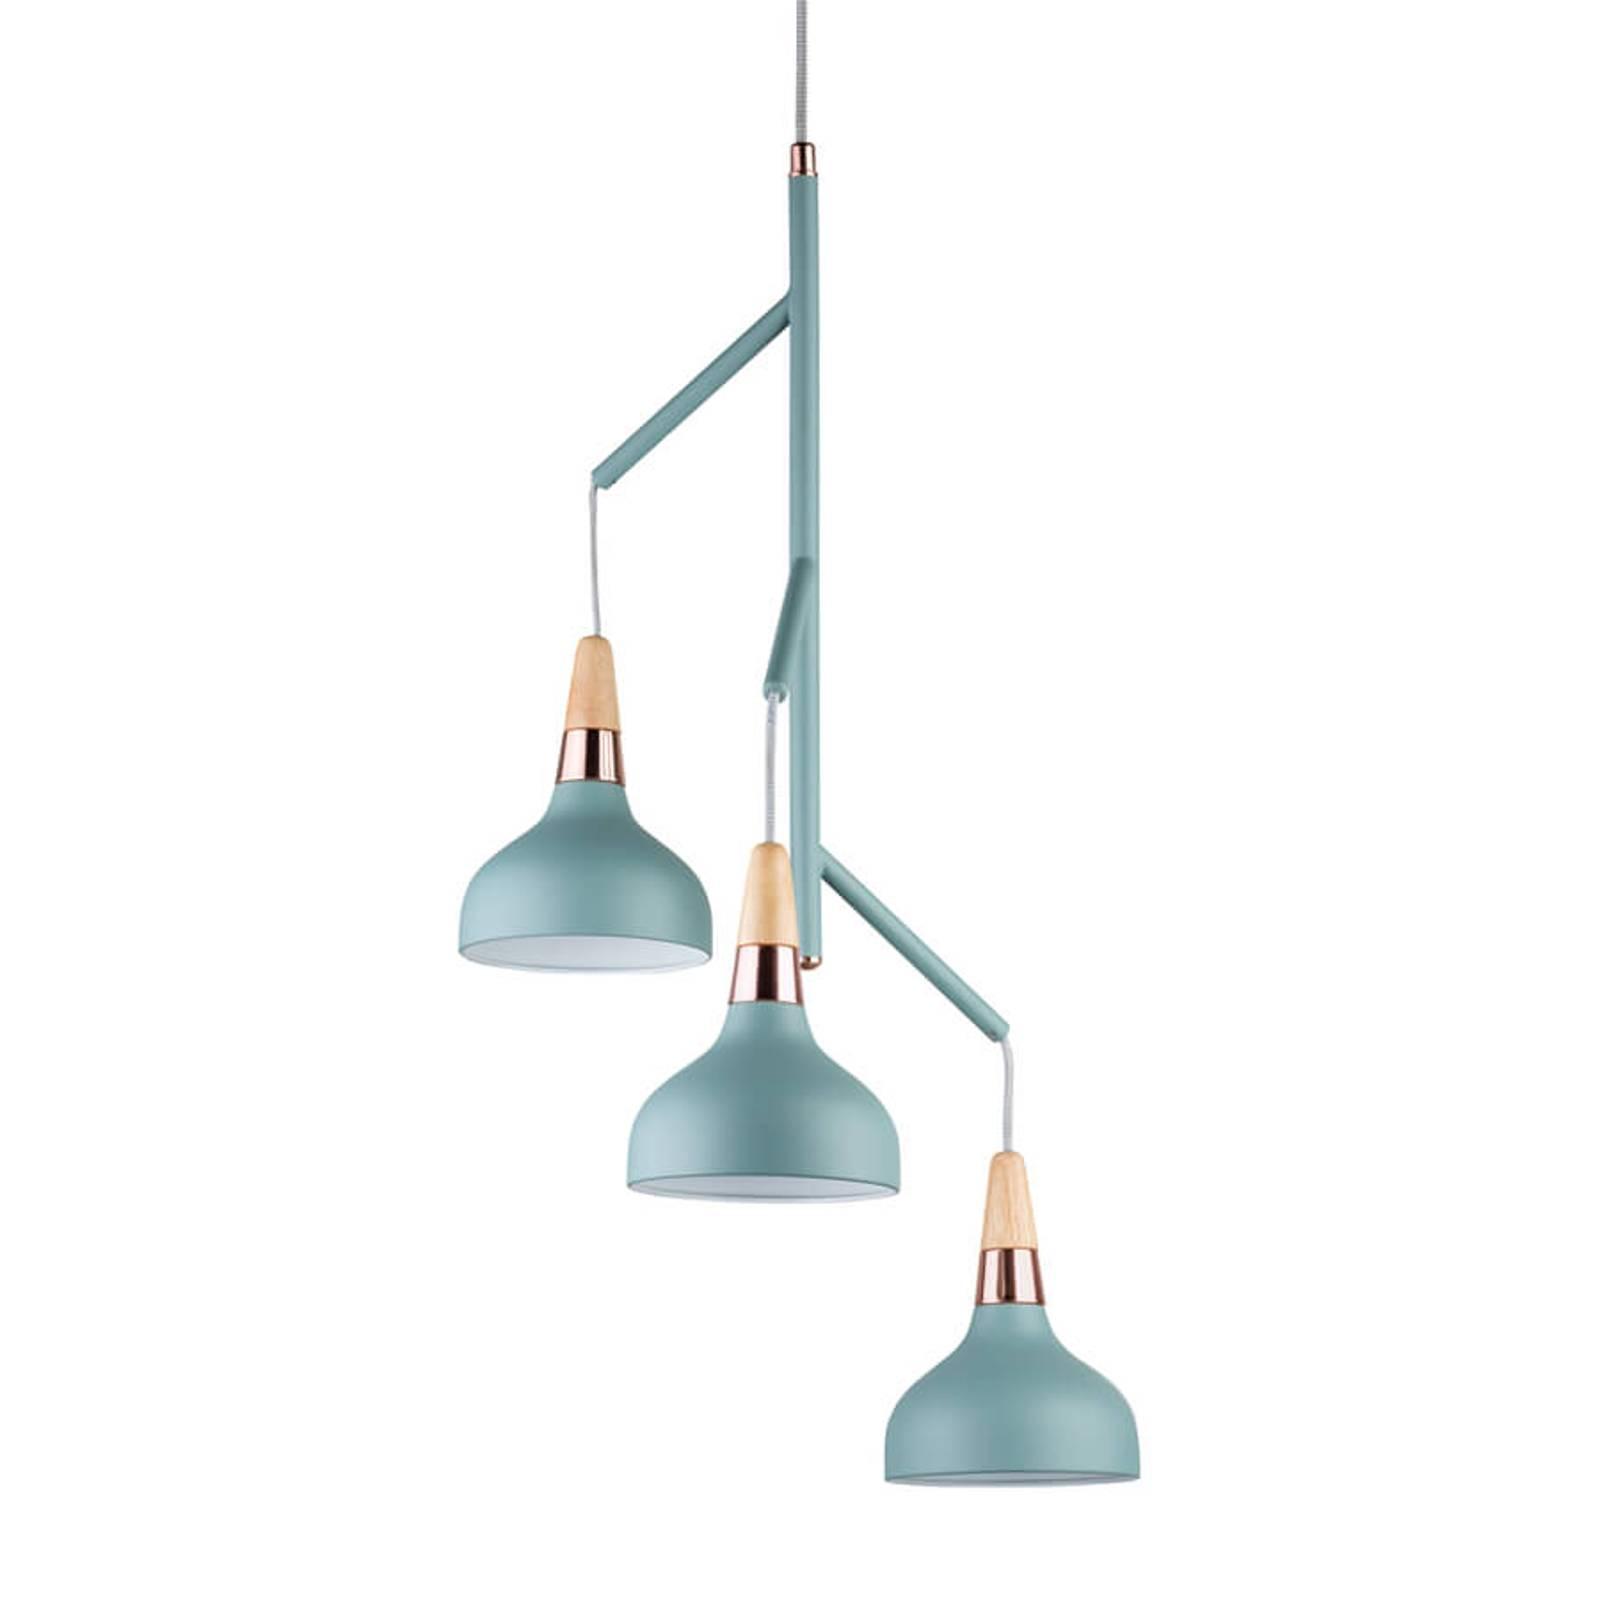 Paulmann Juna hanglamp, 3-lamps